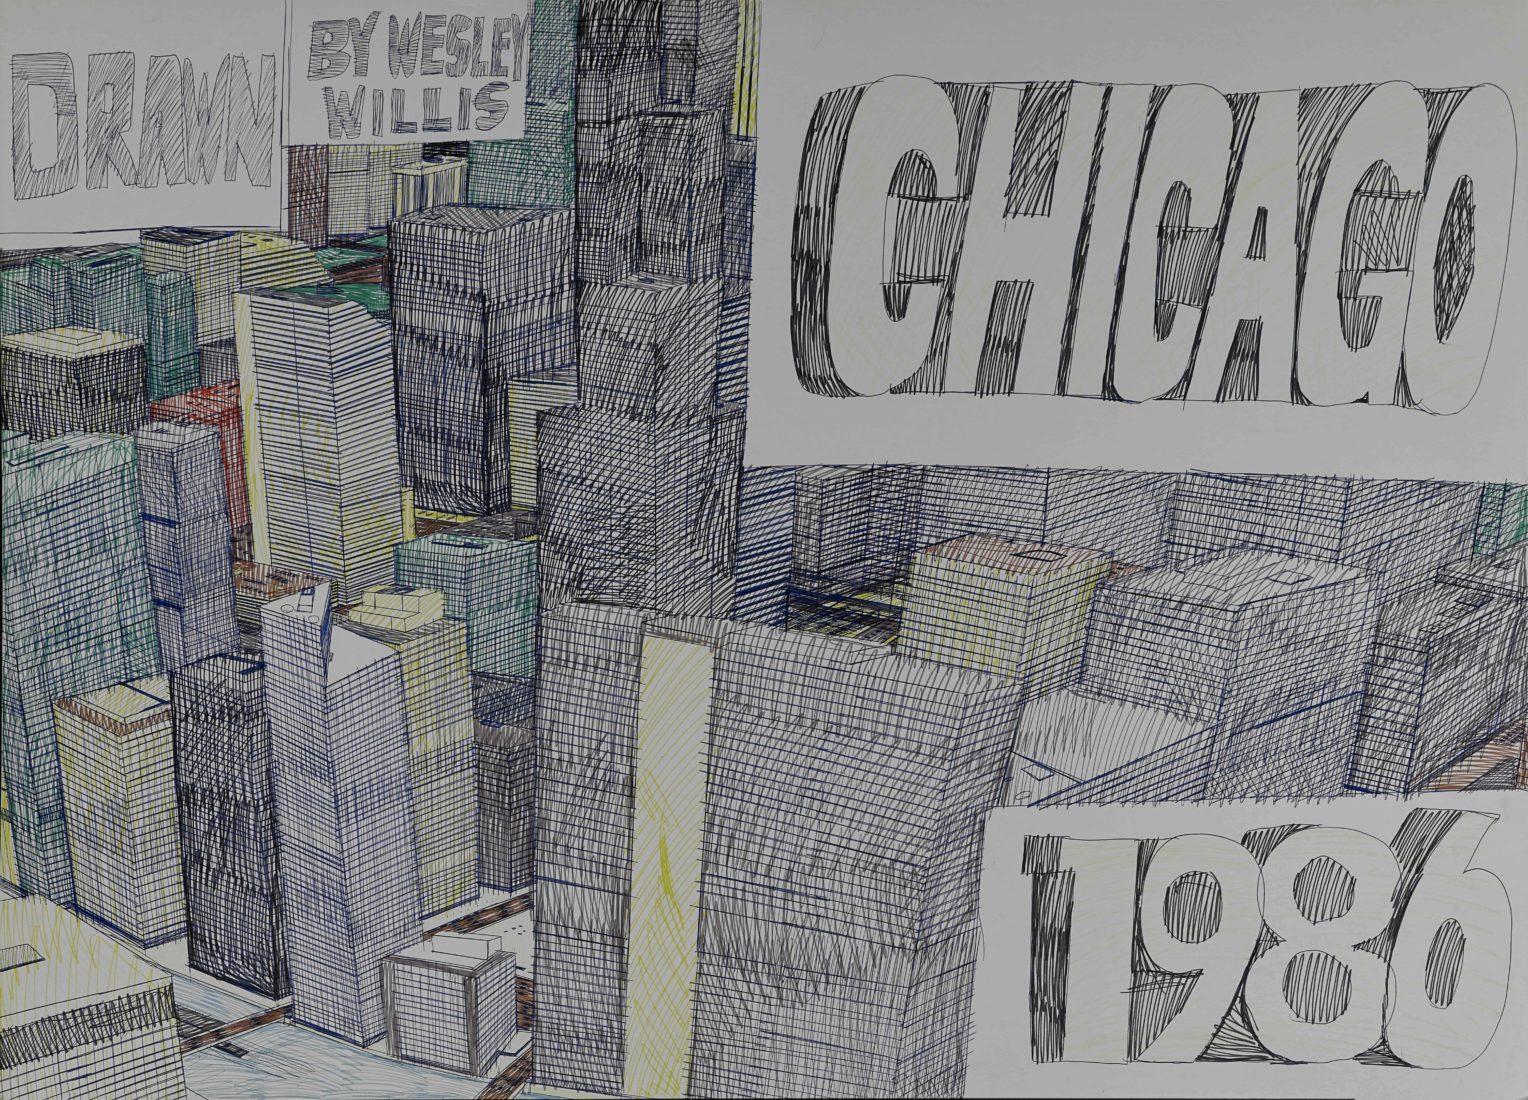 Wesley Willis Chicago 1986,